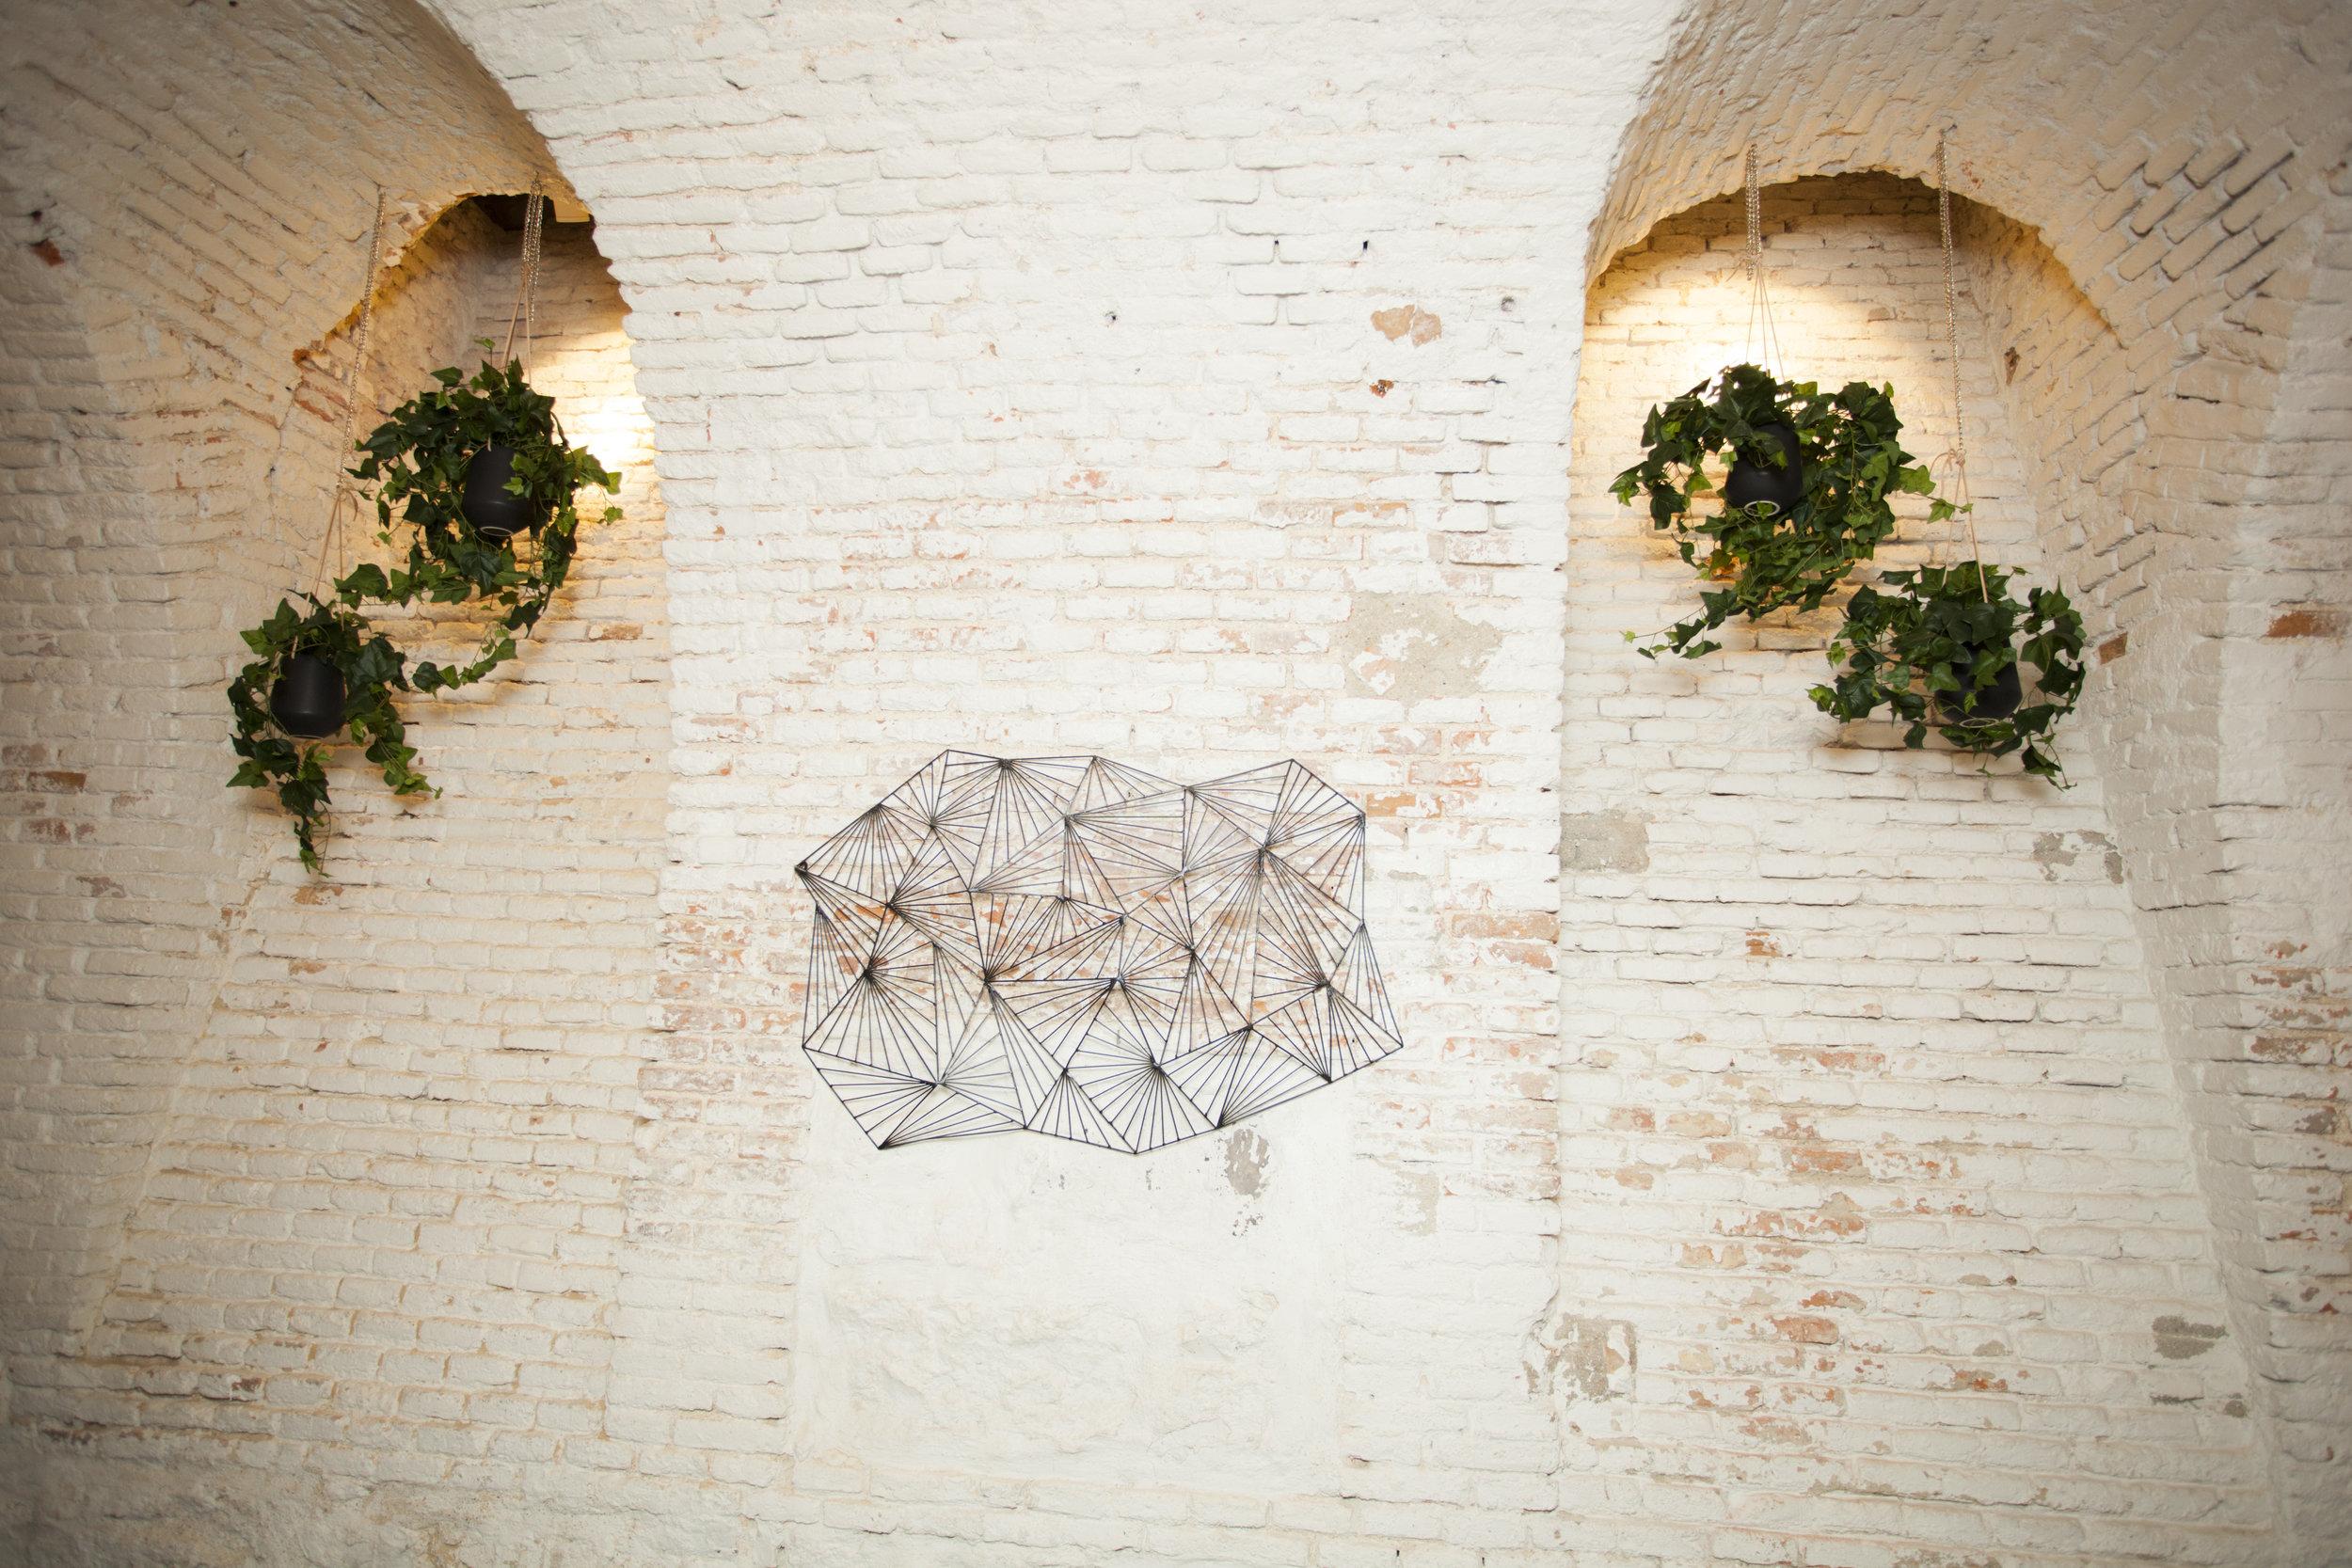 emmme studio restauracion Foodlab UrbanCampus detalle vegetación.jpg